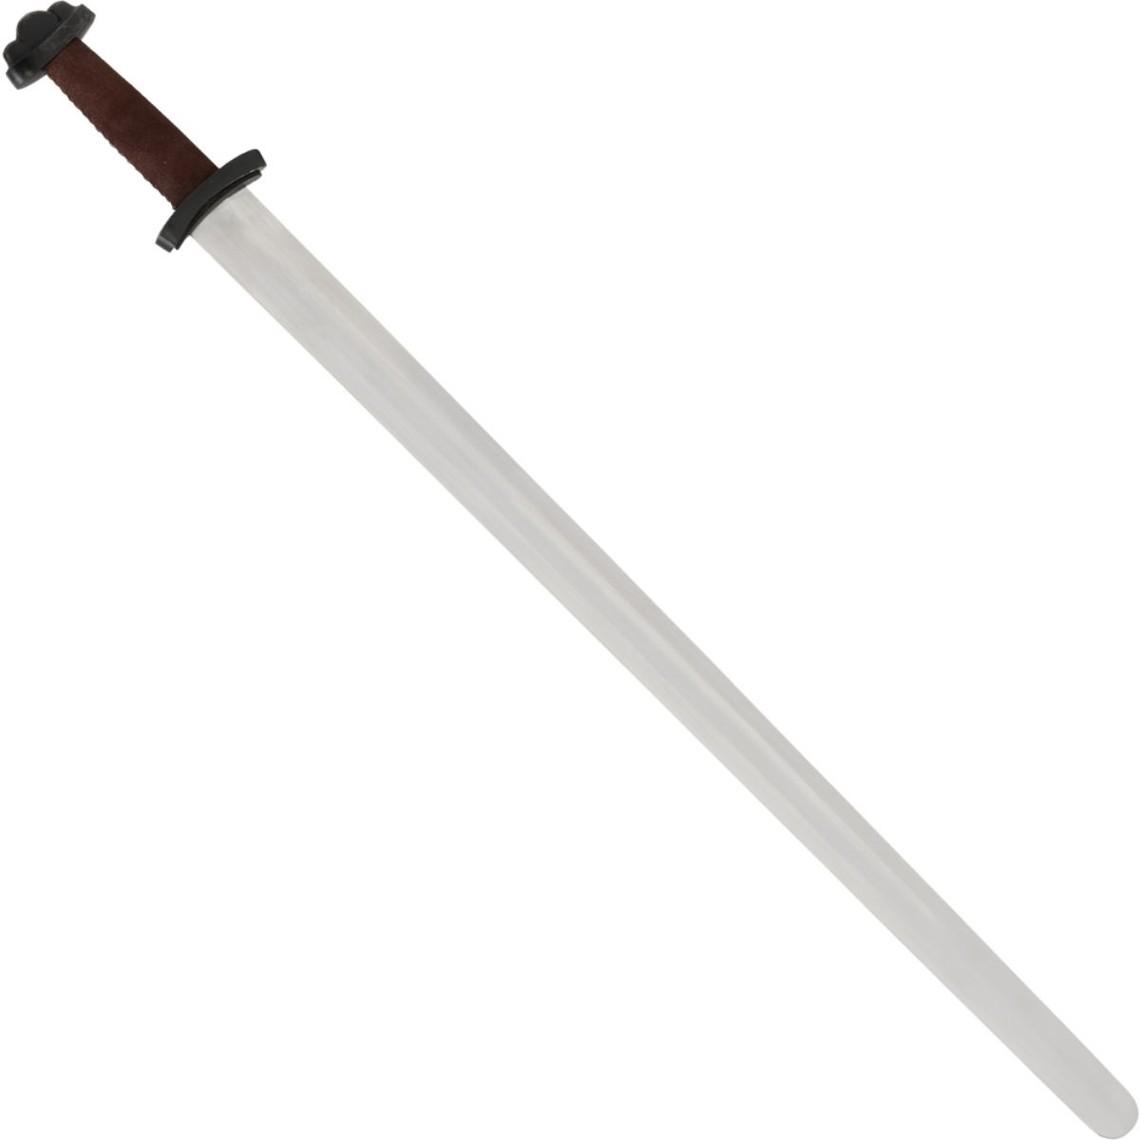 Urs Velunt Espada vikinga Petersen tipo S, lista para la batalla